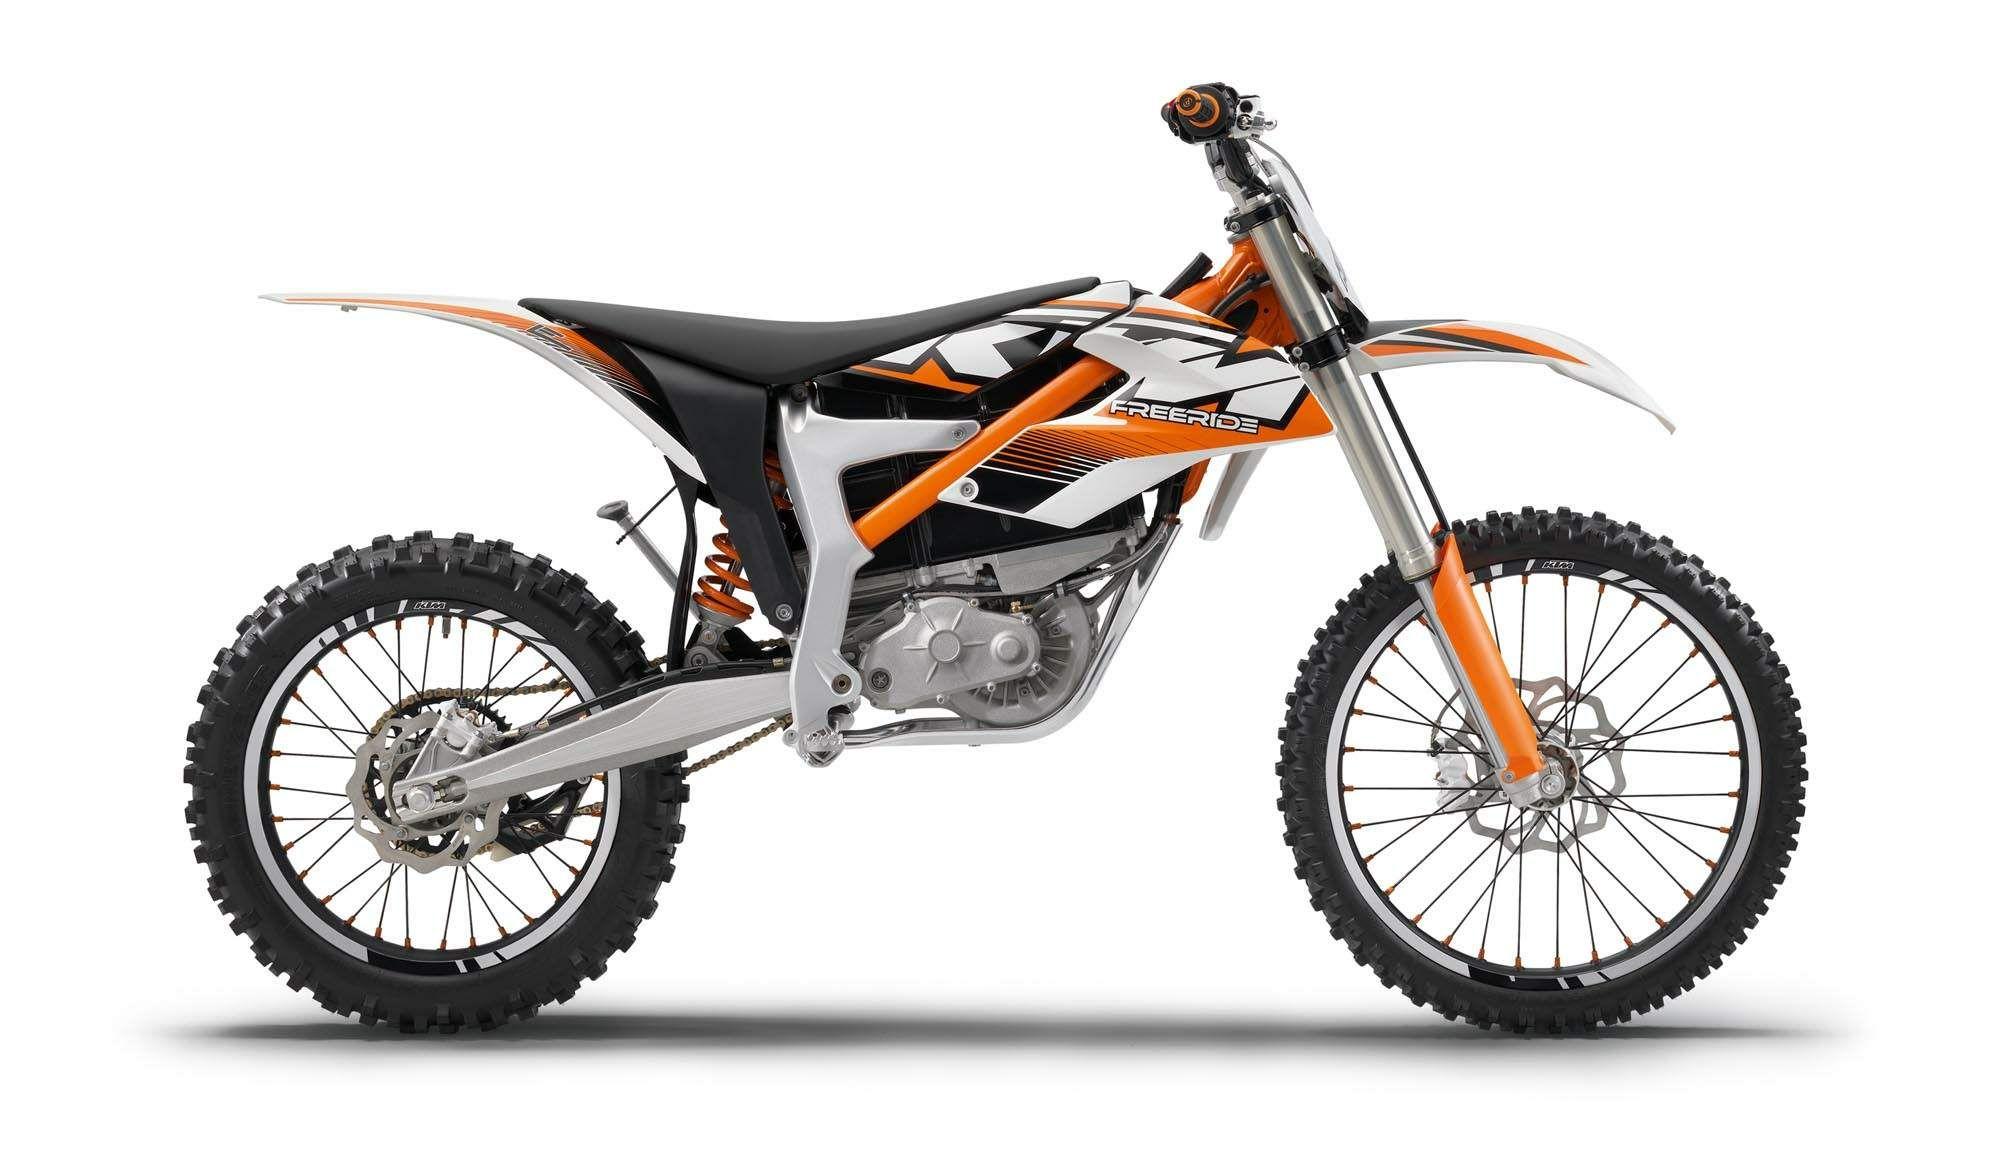 Ktm Freeride E Electric Motorcycle Ktm Electric Dirt Bike